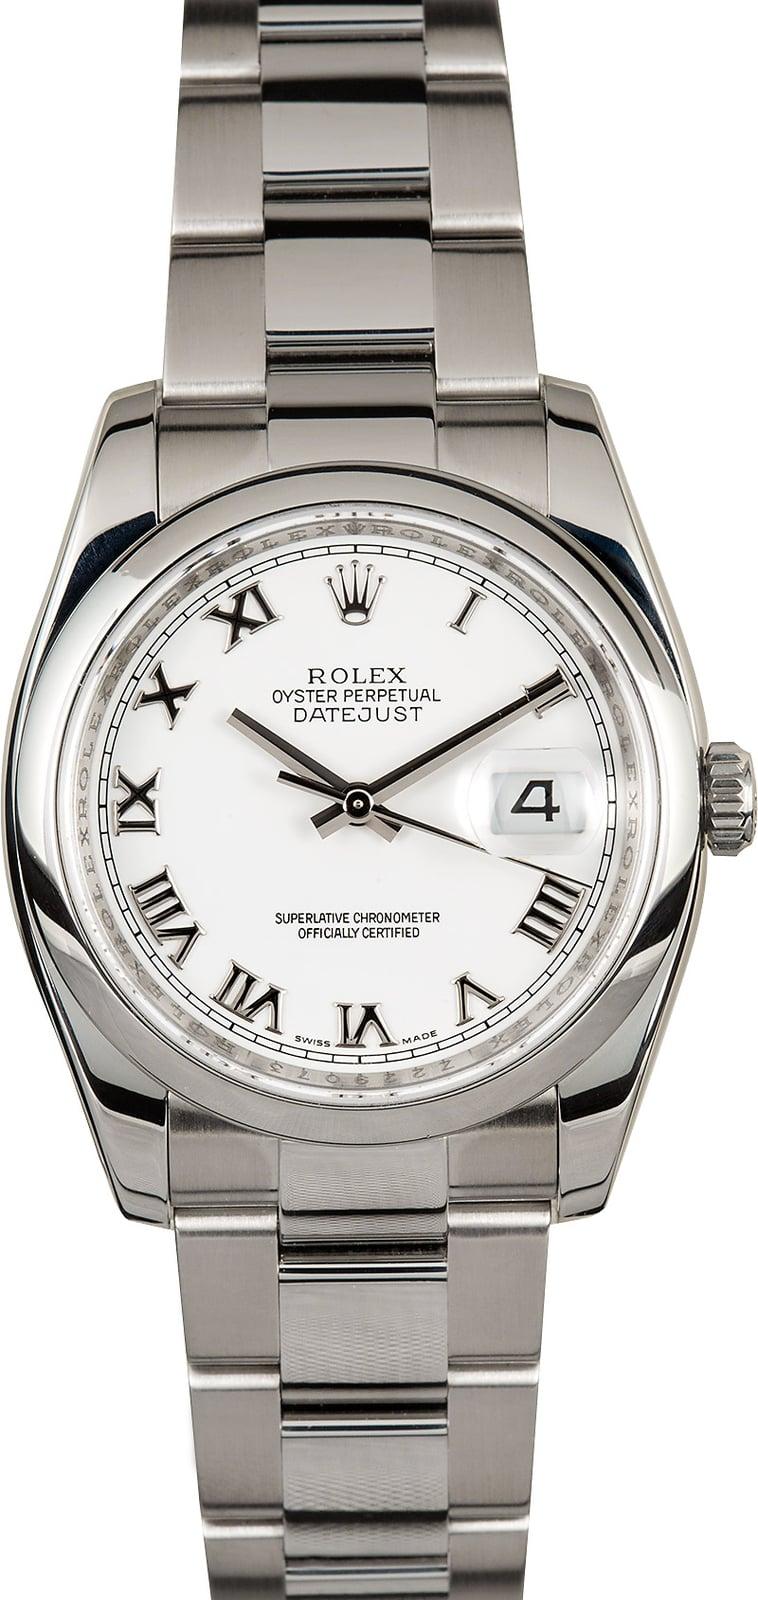 Rolex Datejust 116200 White Roman Dial